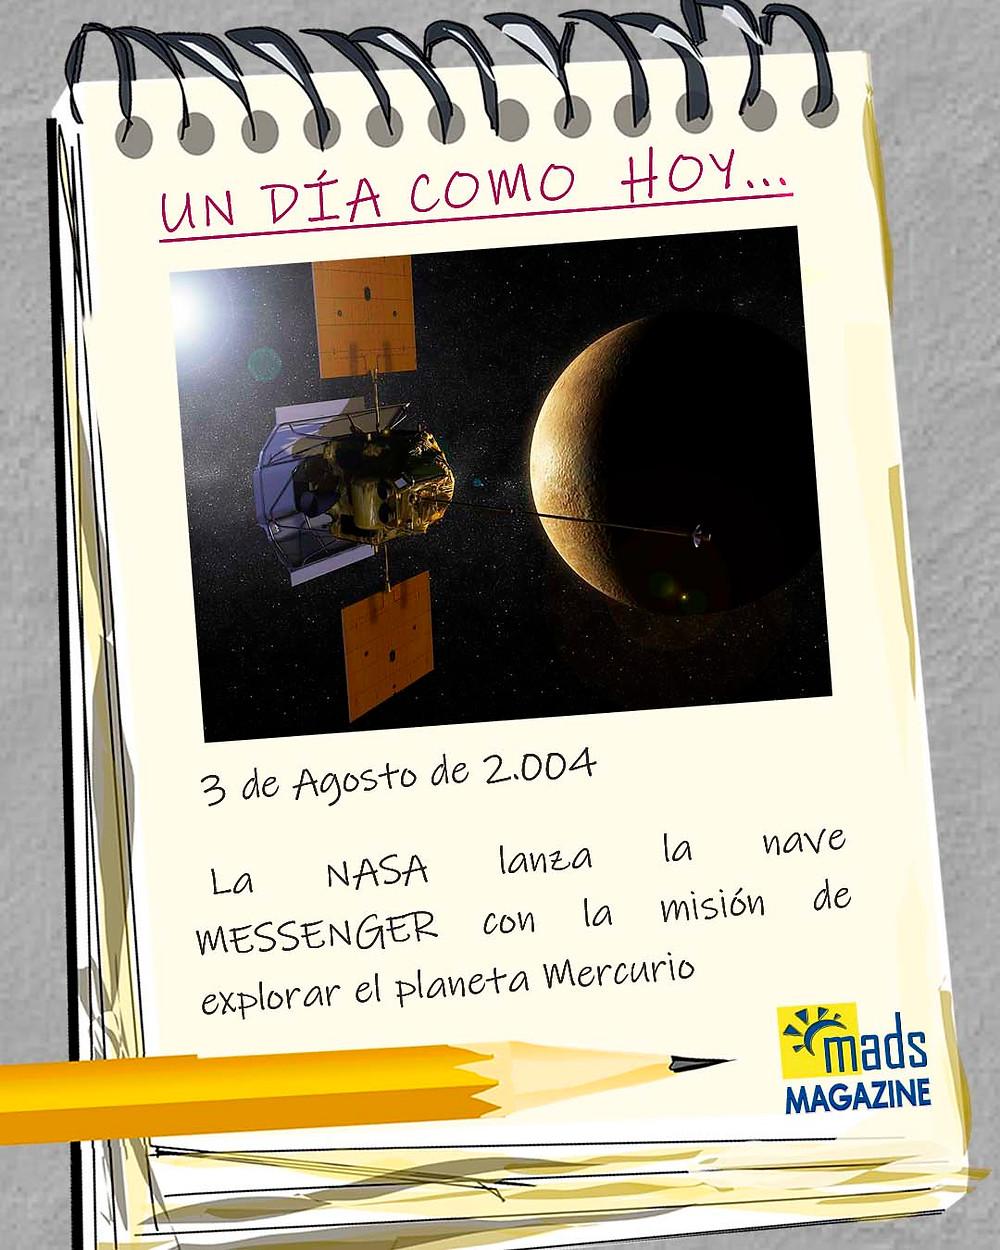 El 3 de agosto de 2004 Messenger partió rumbo a Mercurio